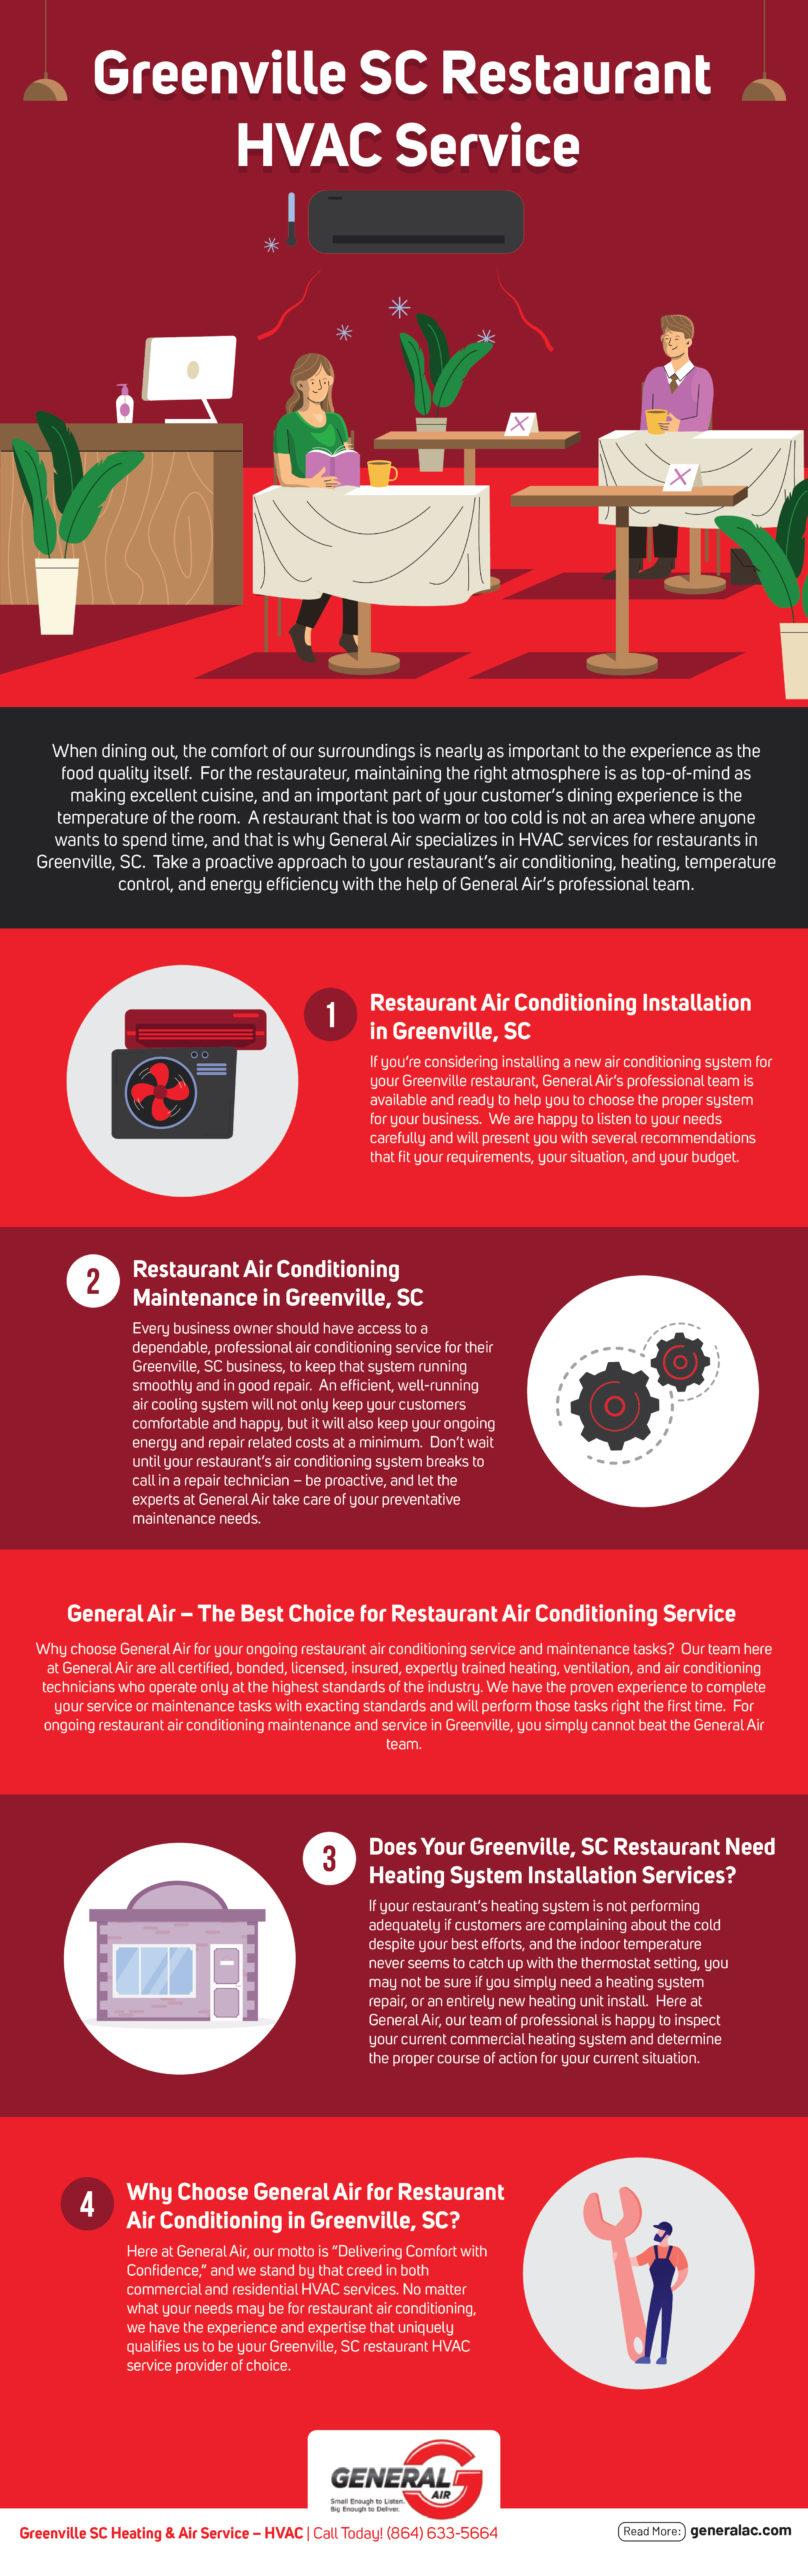 Greenville Restaurant HVAC Service Infographic